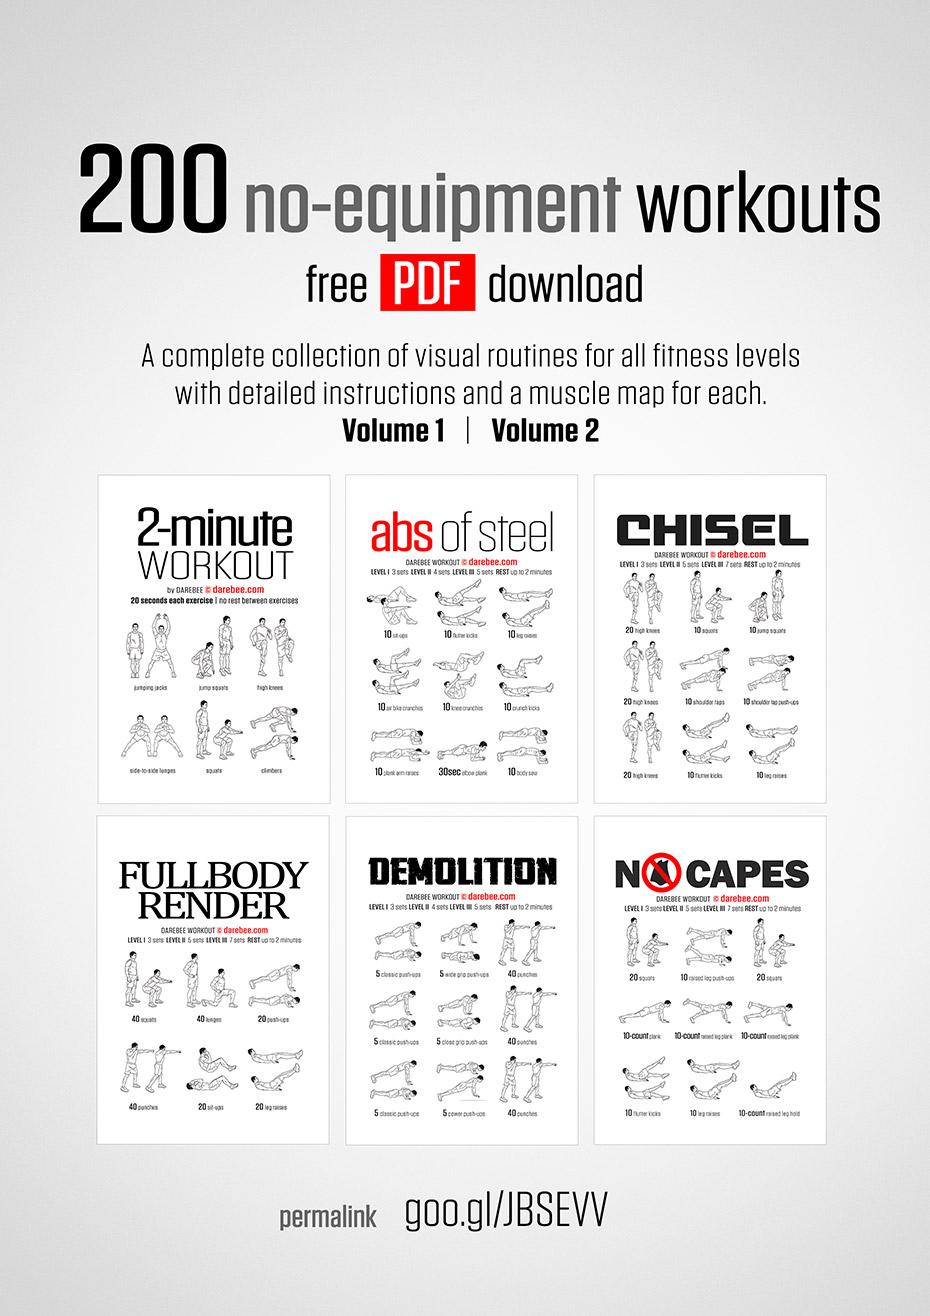 medium resolution of 200 no equipment workouts